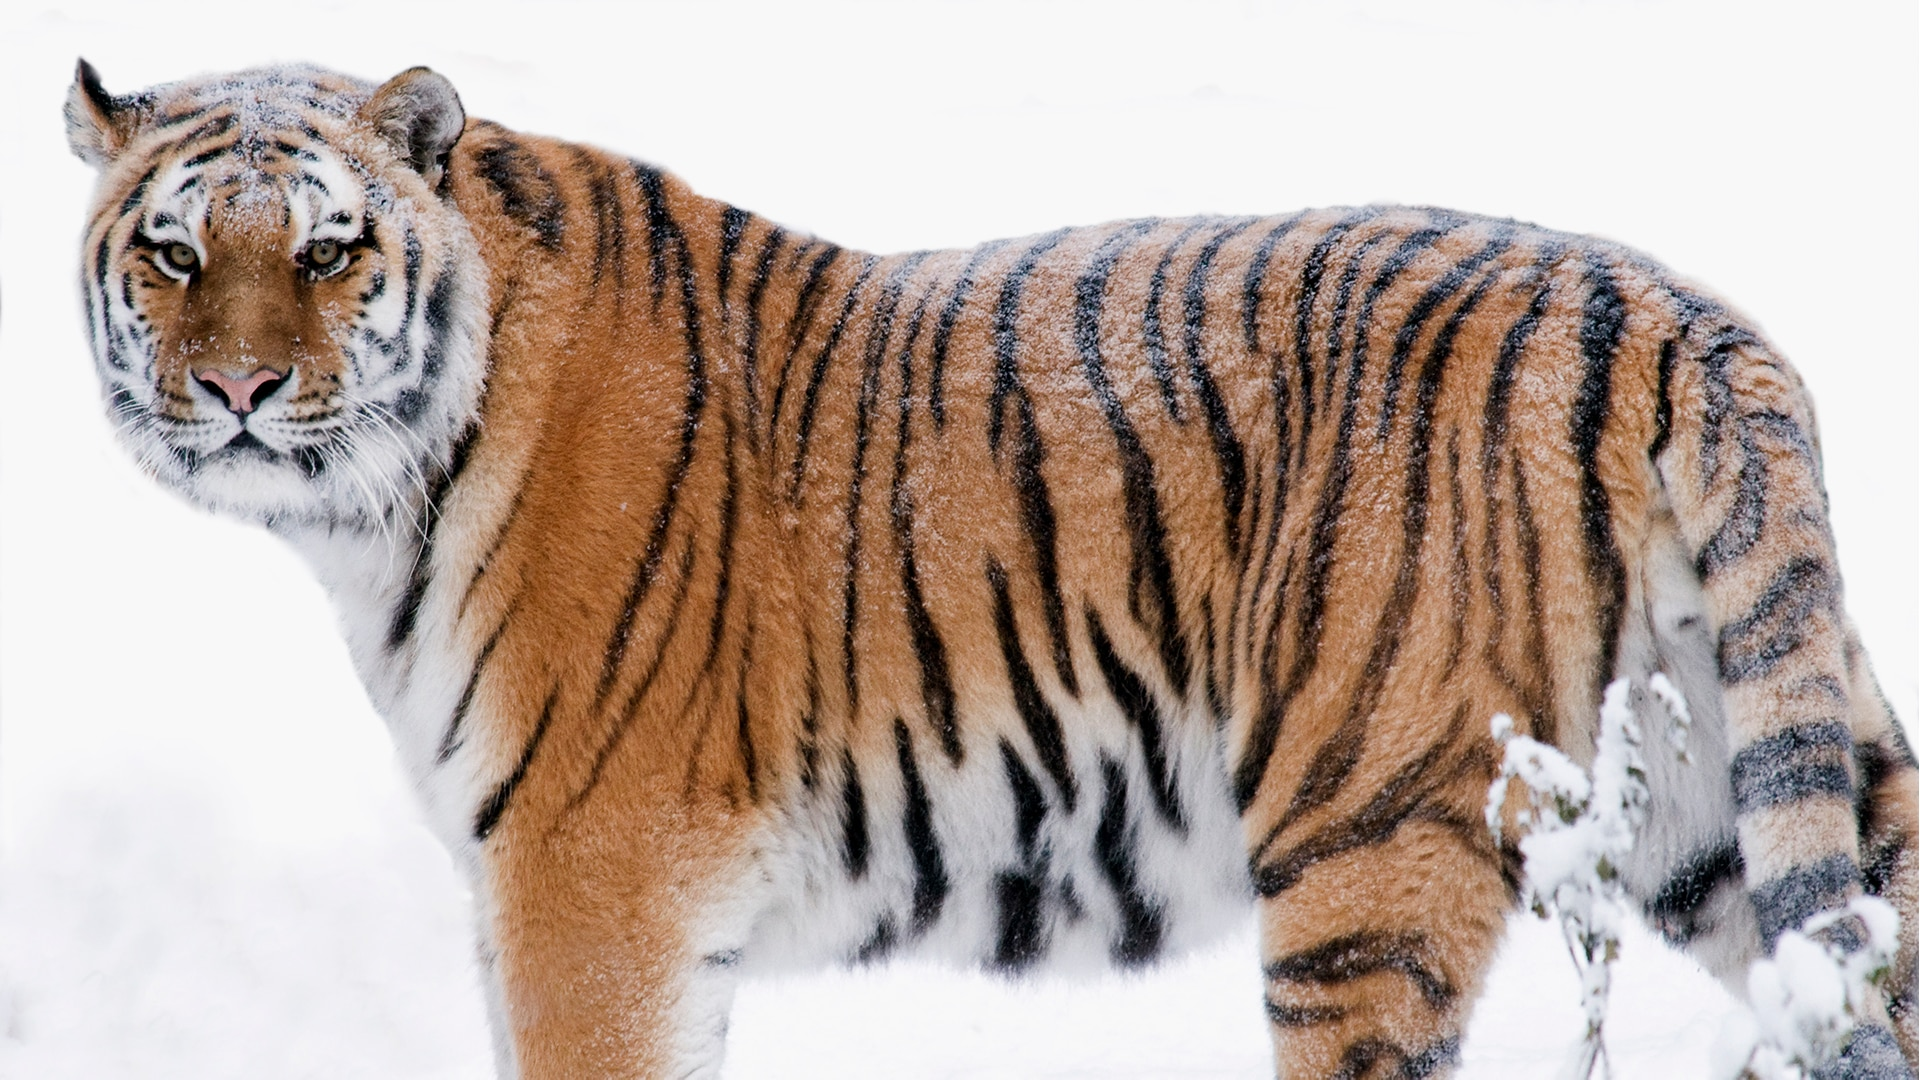 Amur tiger walks in the snow